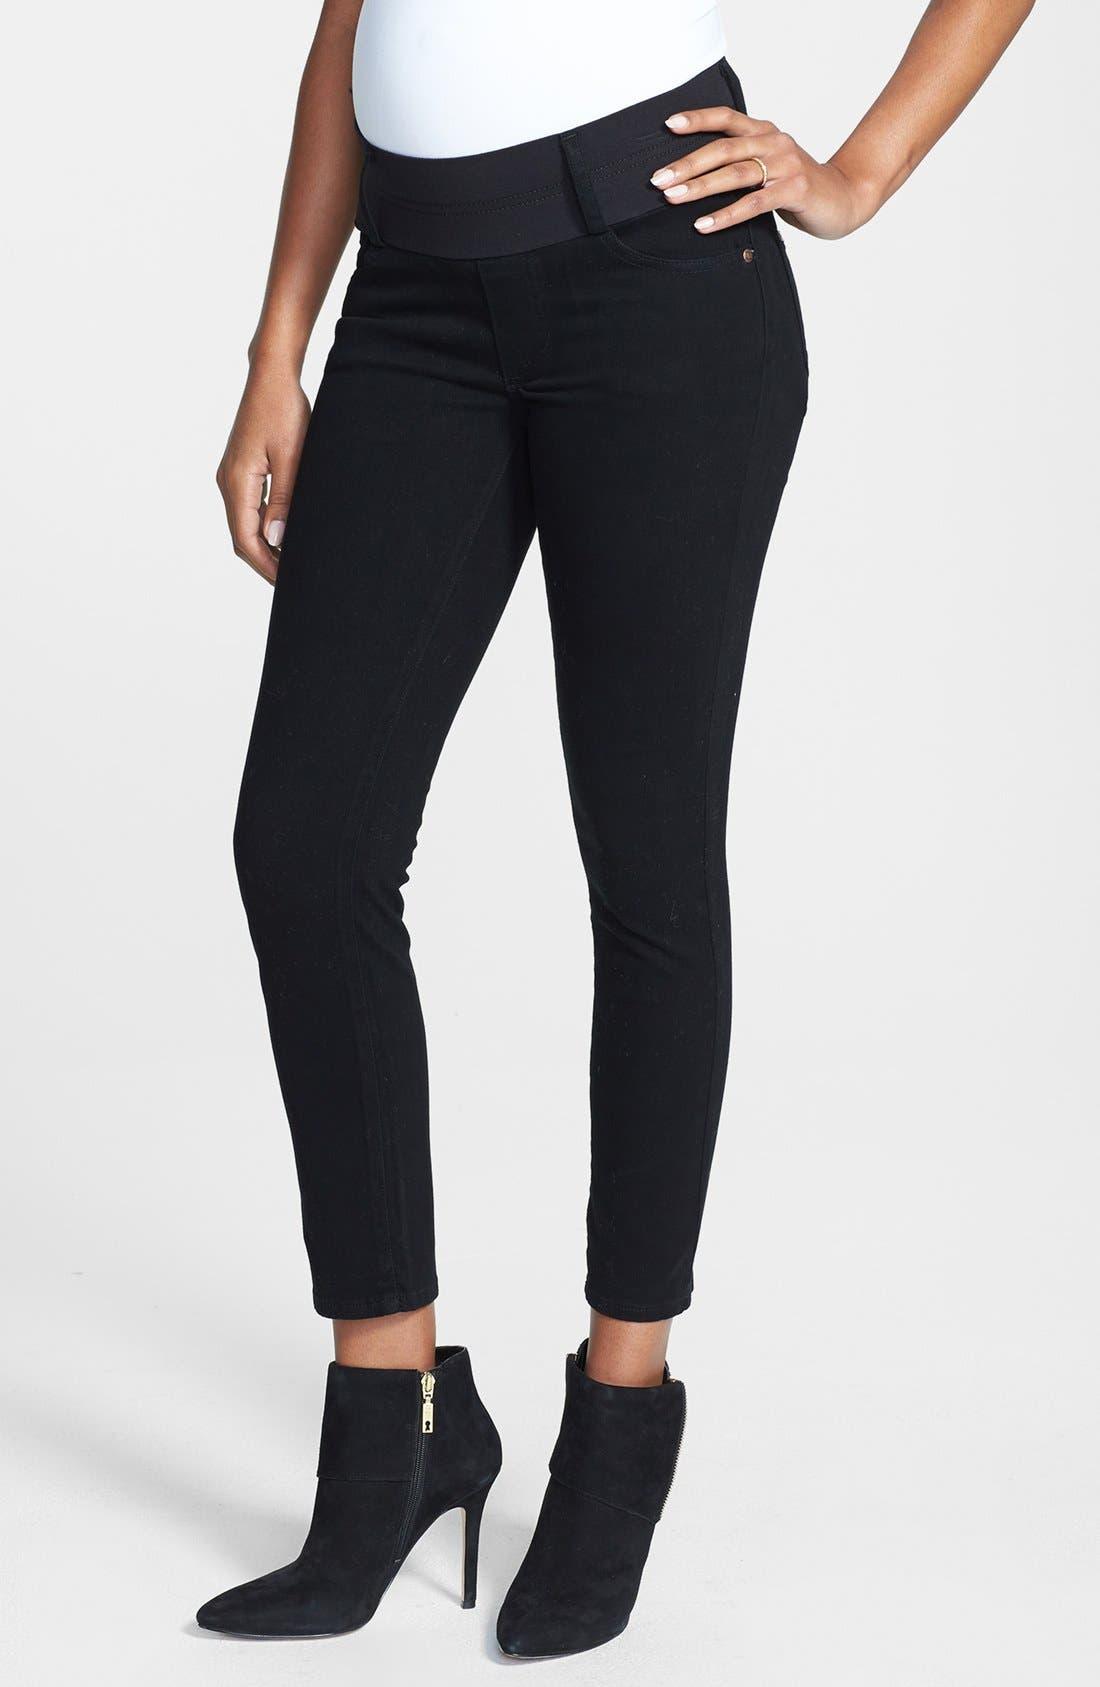 Women's Maternal America Maternity Skinny Ankle Stretch Jeans